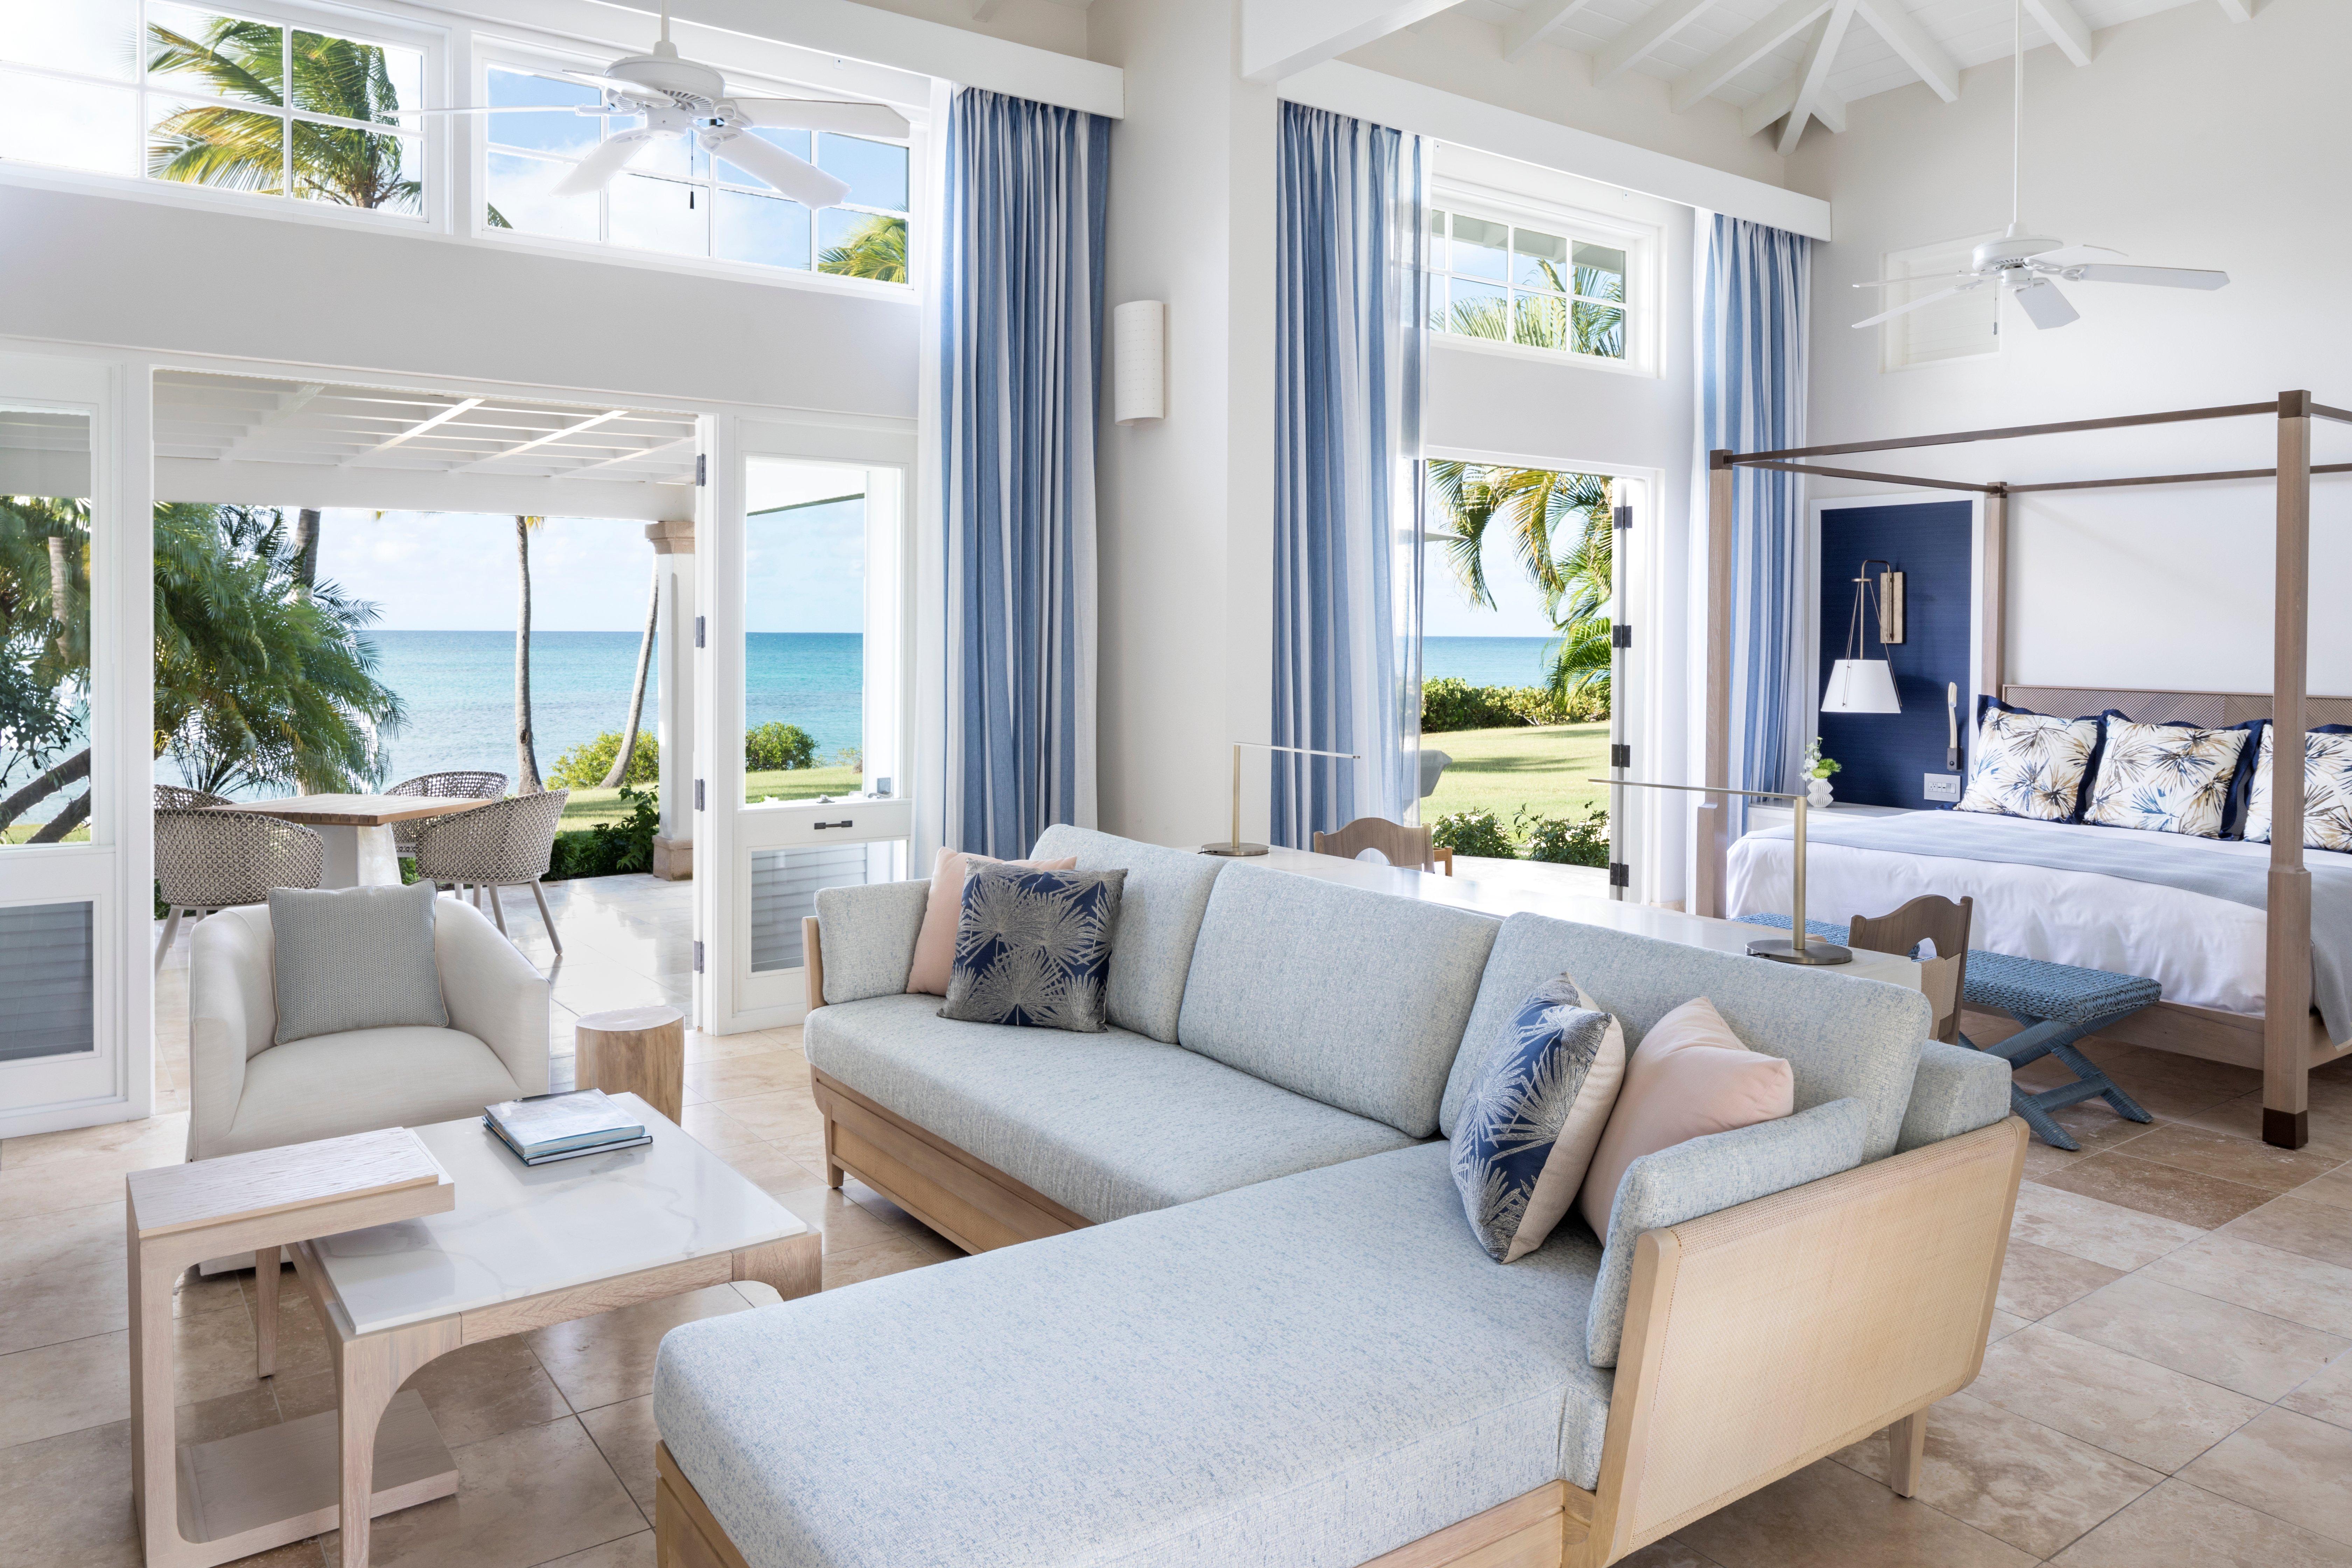 Living Room Luxury Resort in The Caribbean